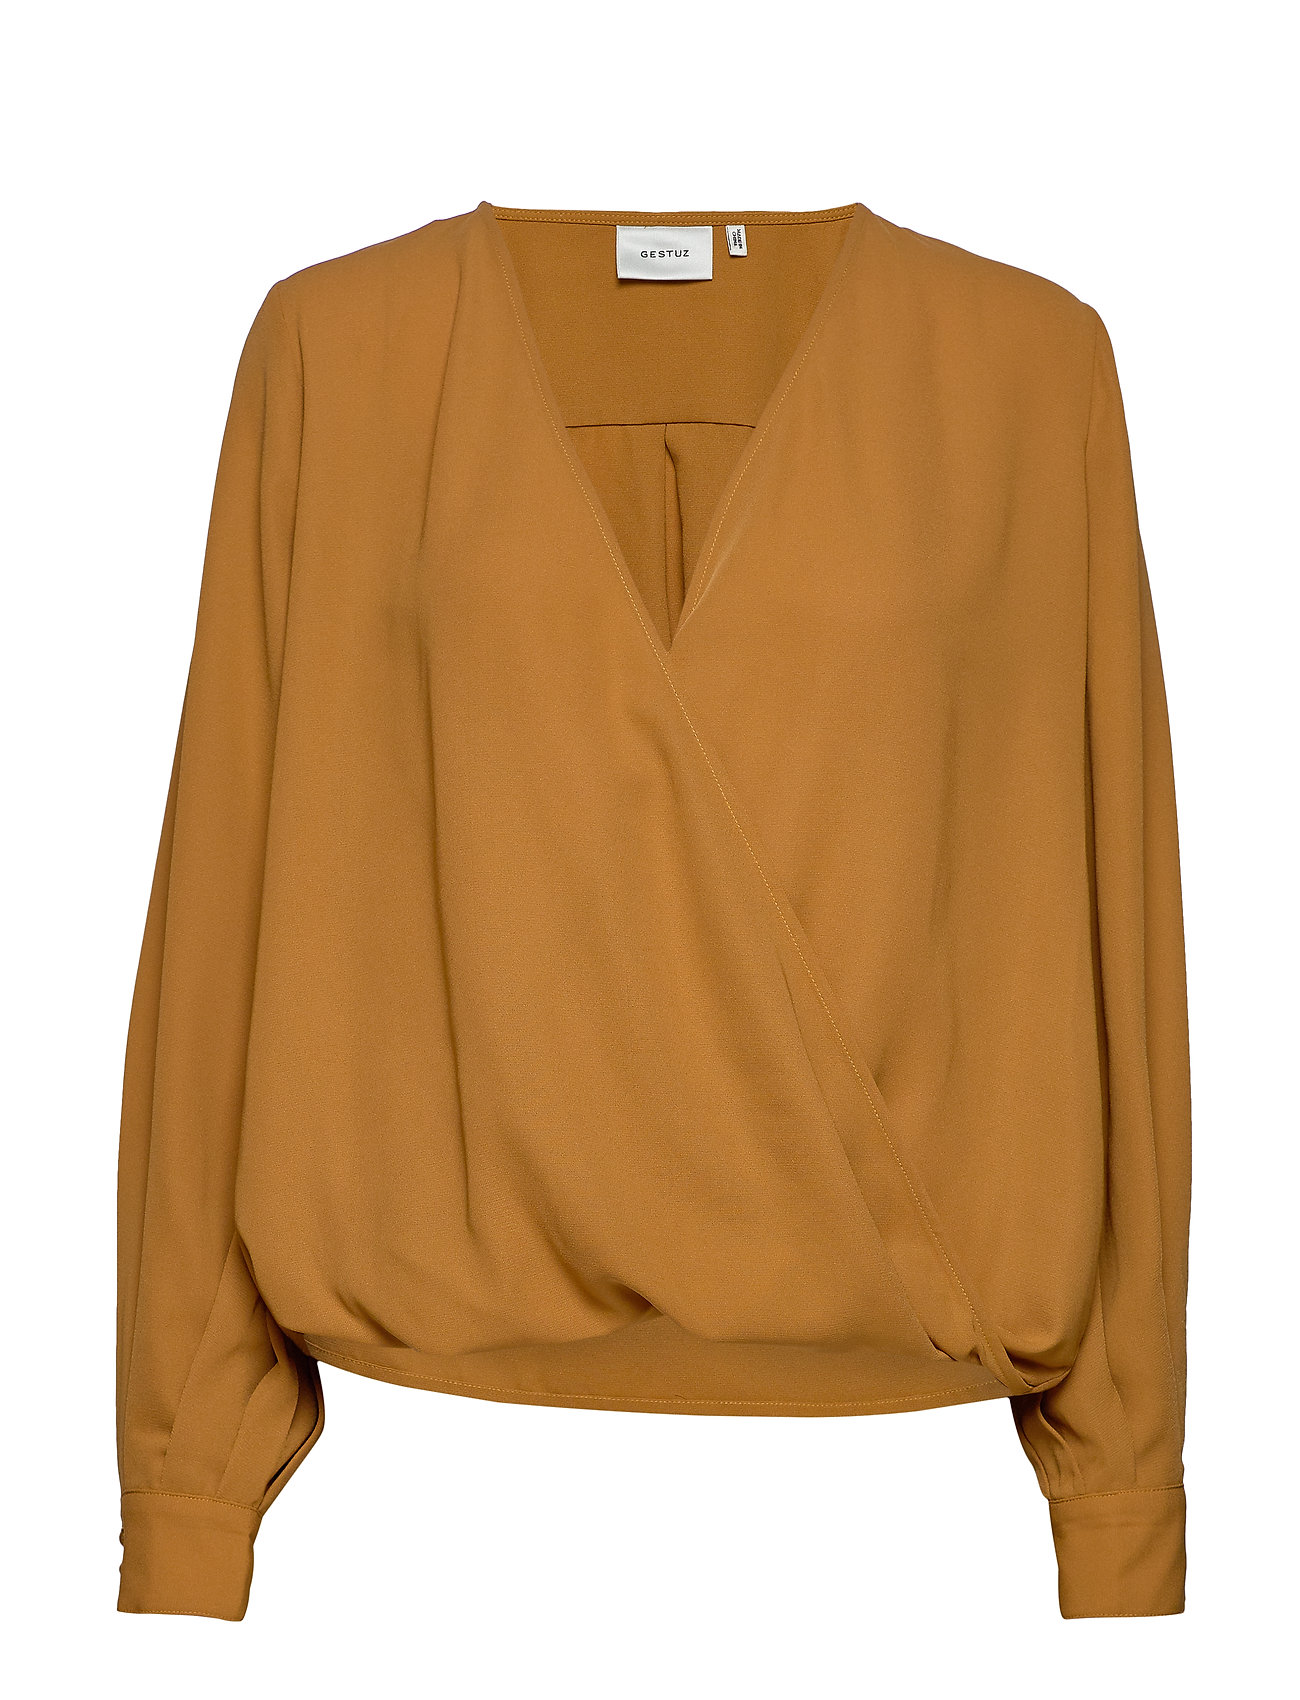 Gestuz CeniaGZ wrap blouse SO20 - BONE BROWN